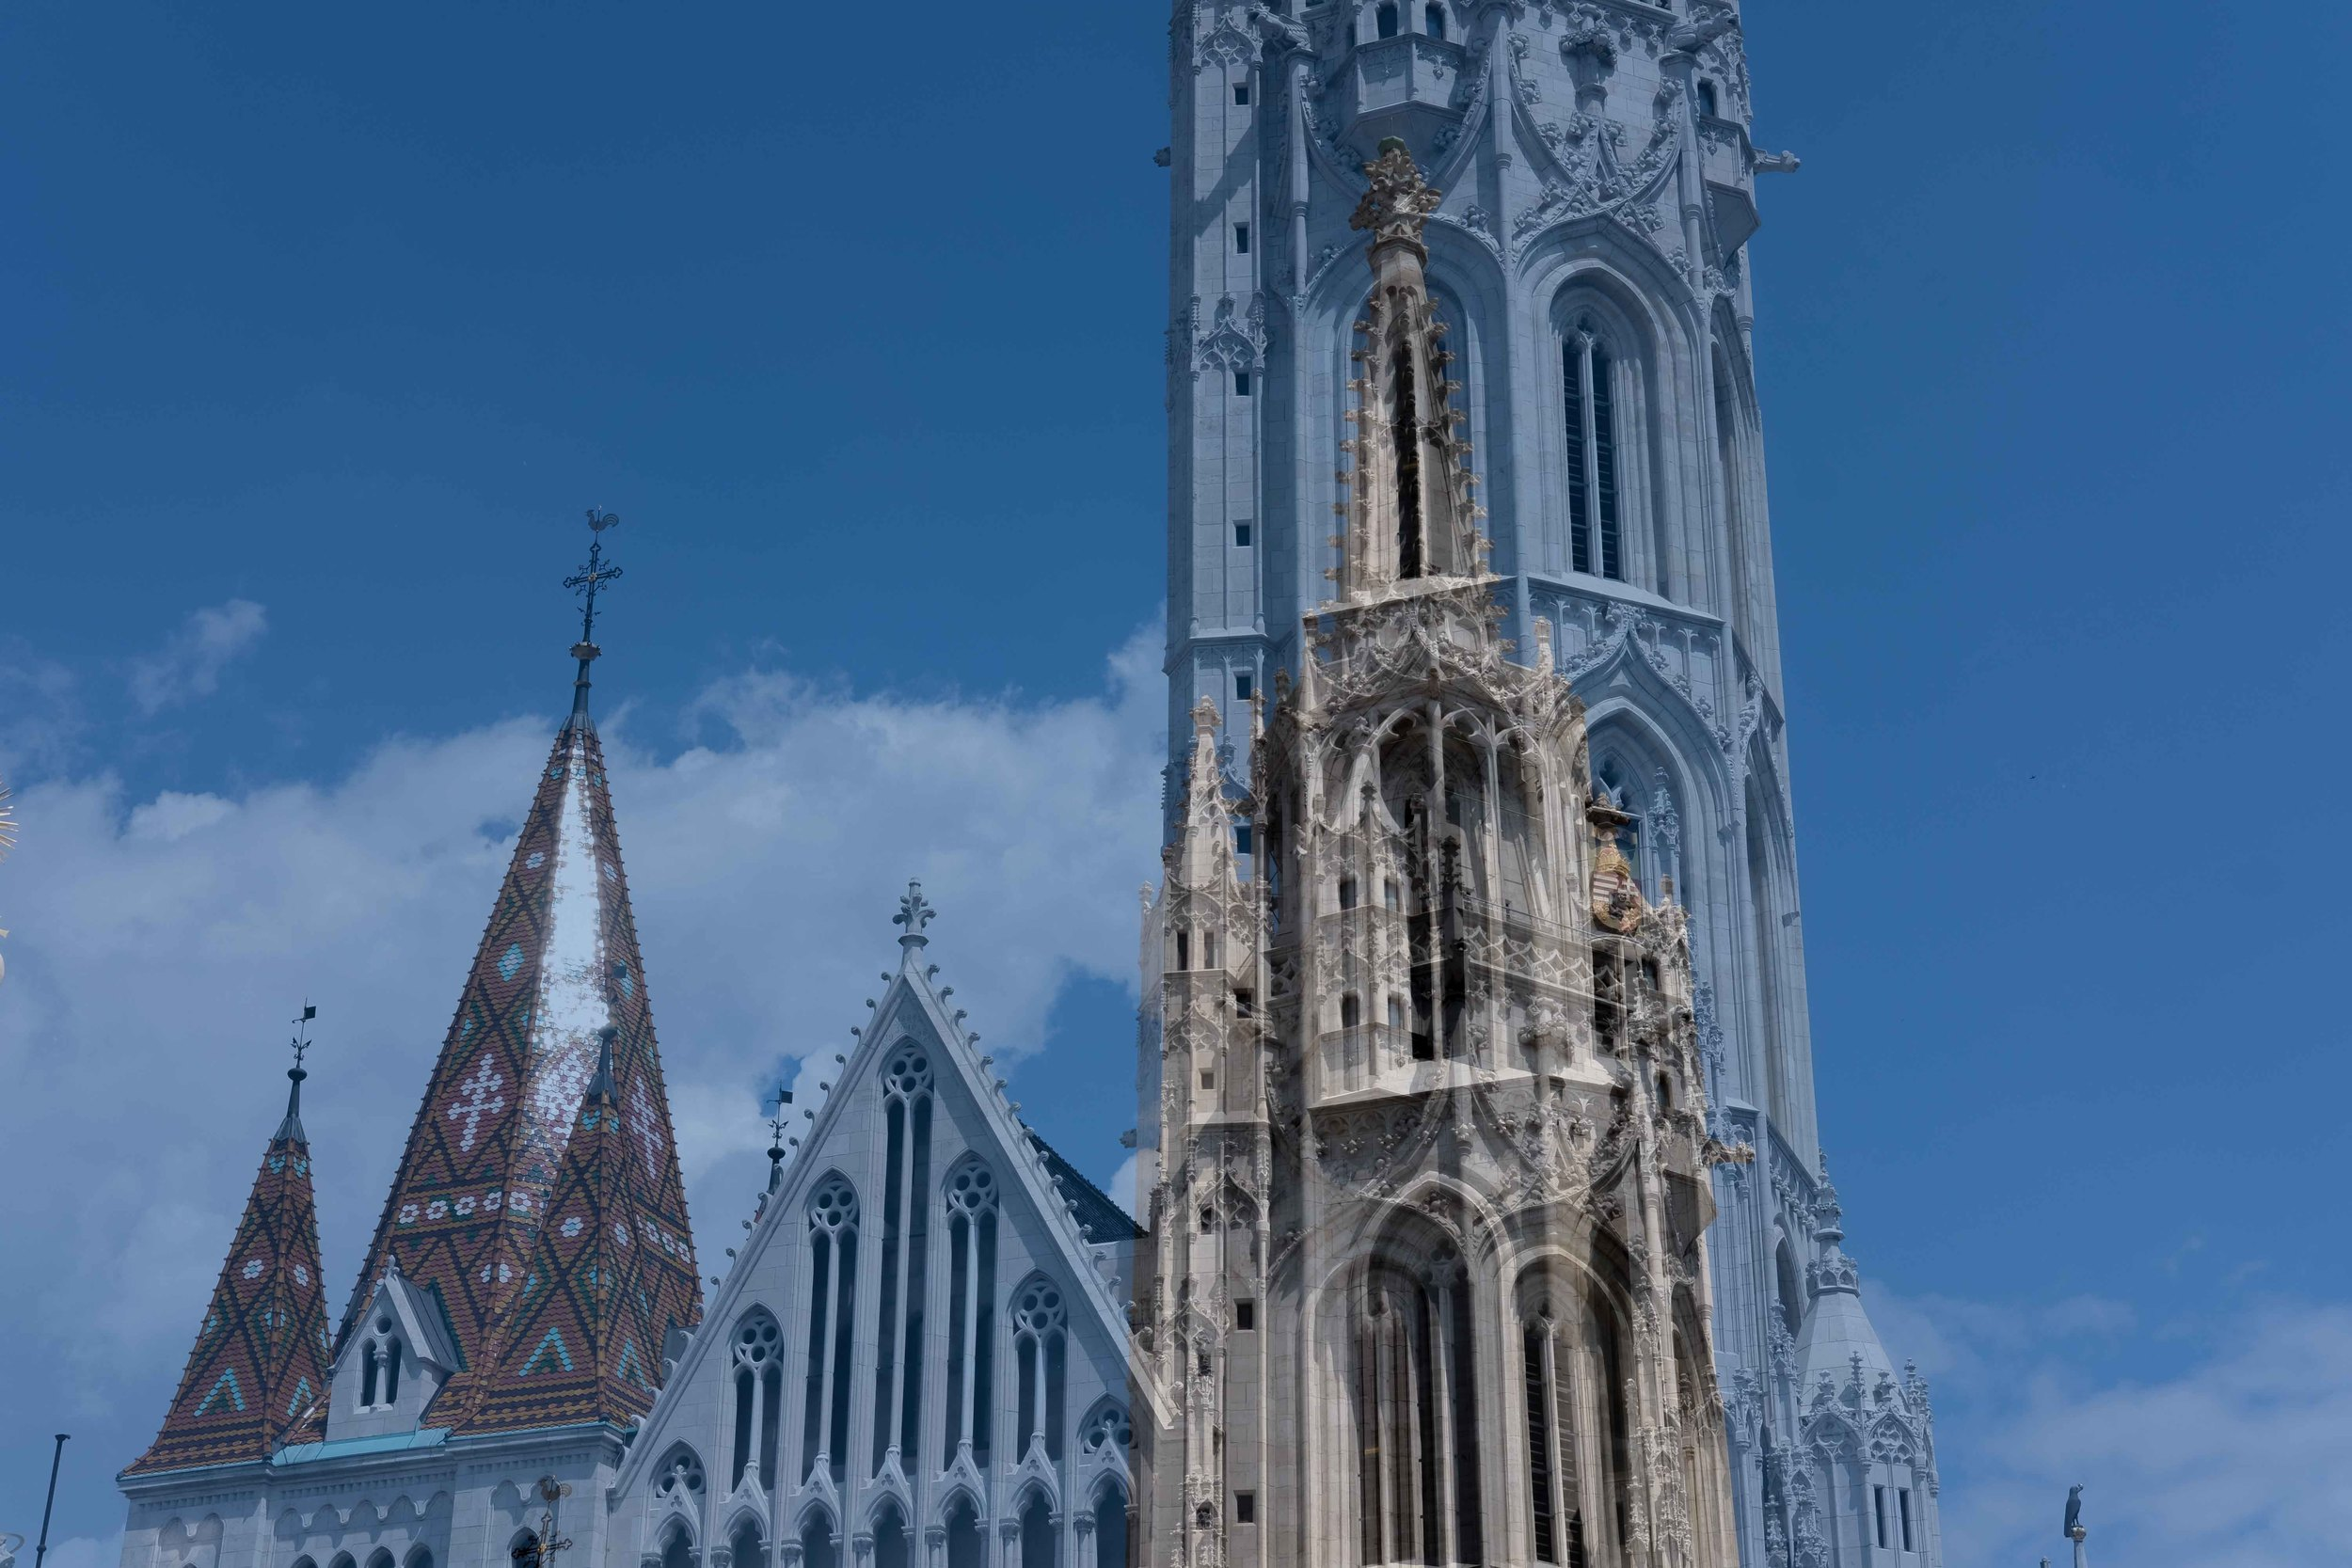 Grand ecclesial architecture.